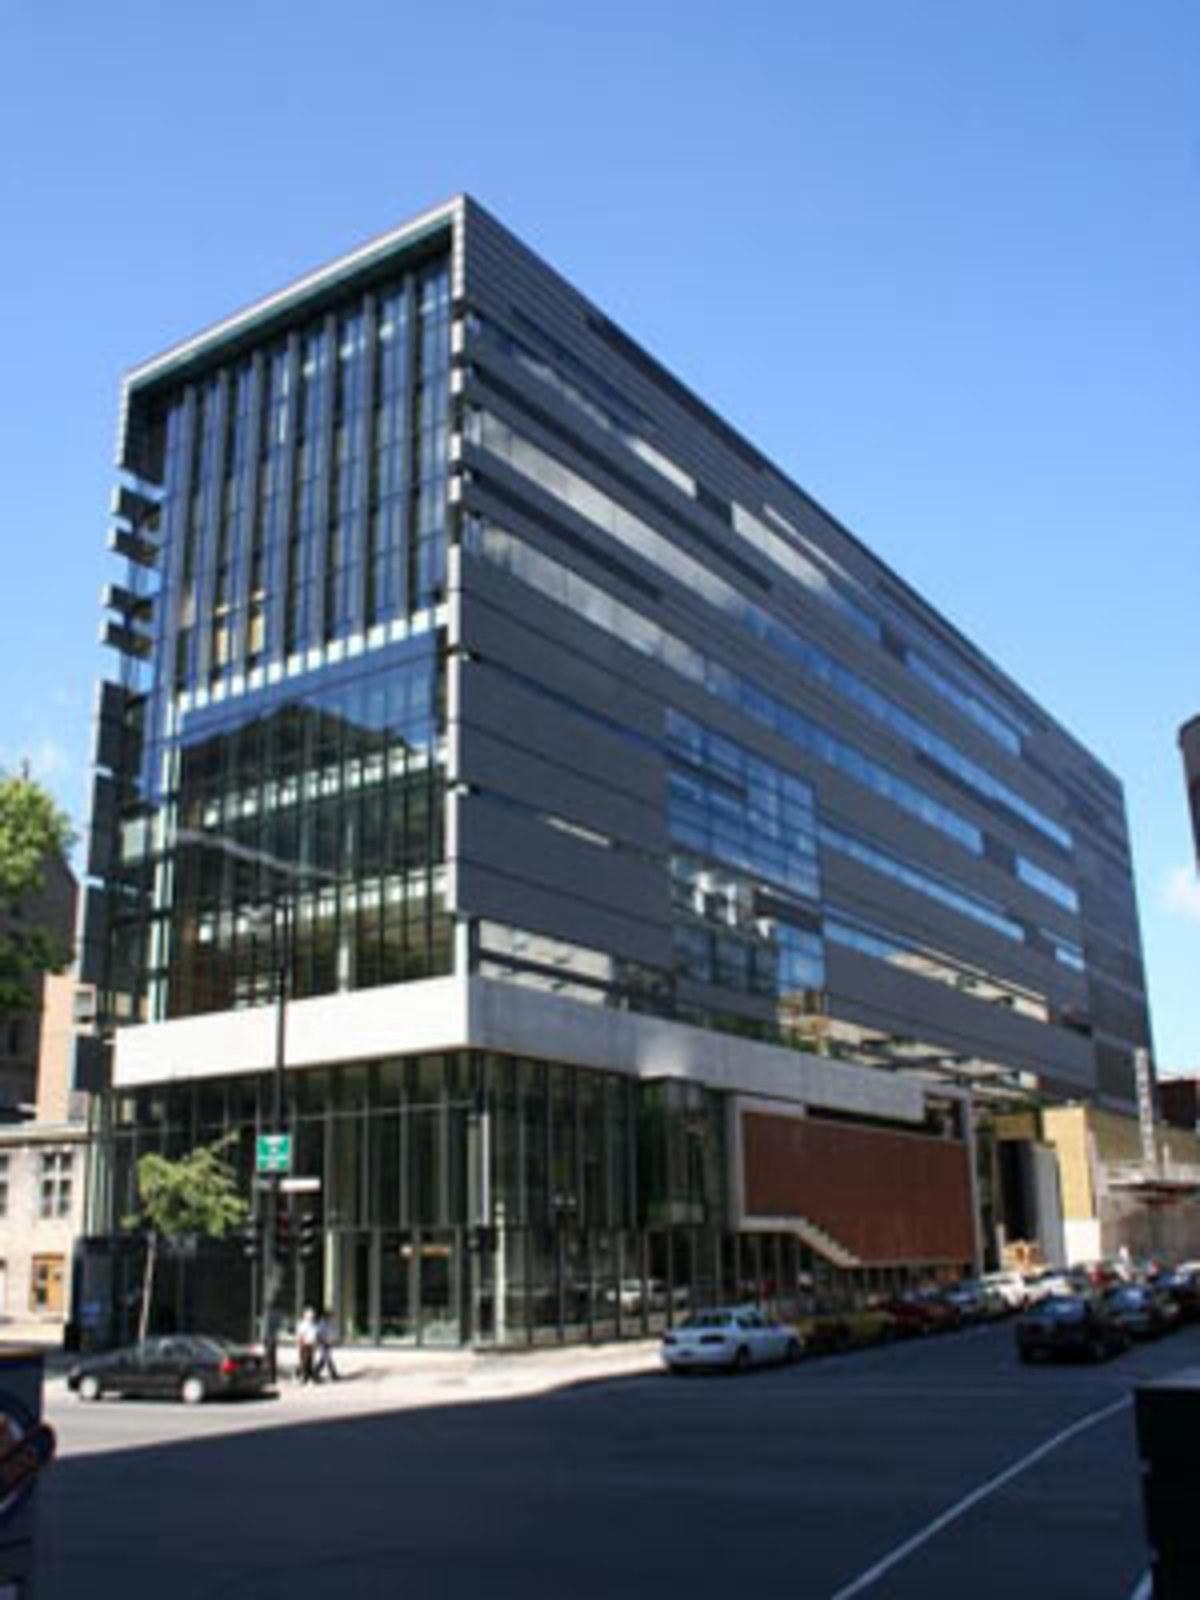 Faculty of Music - McGill University, Saucier + Perrotte und Menkès Shooner Dagenais. Montreal, 2005